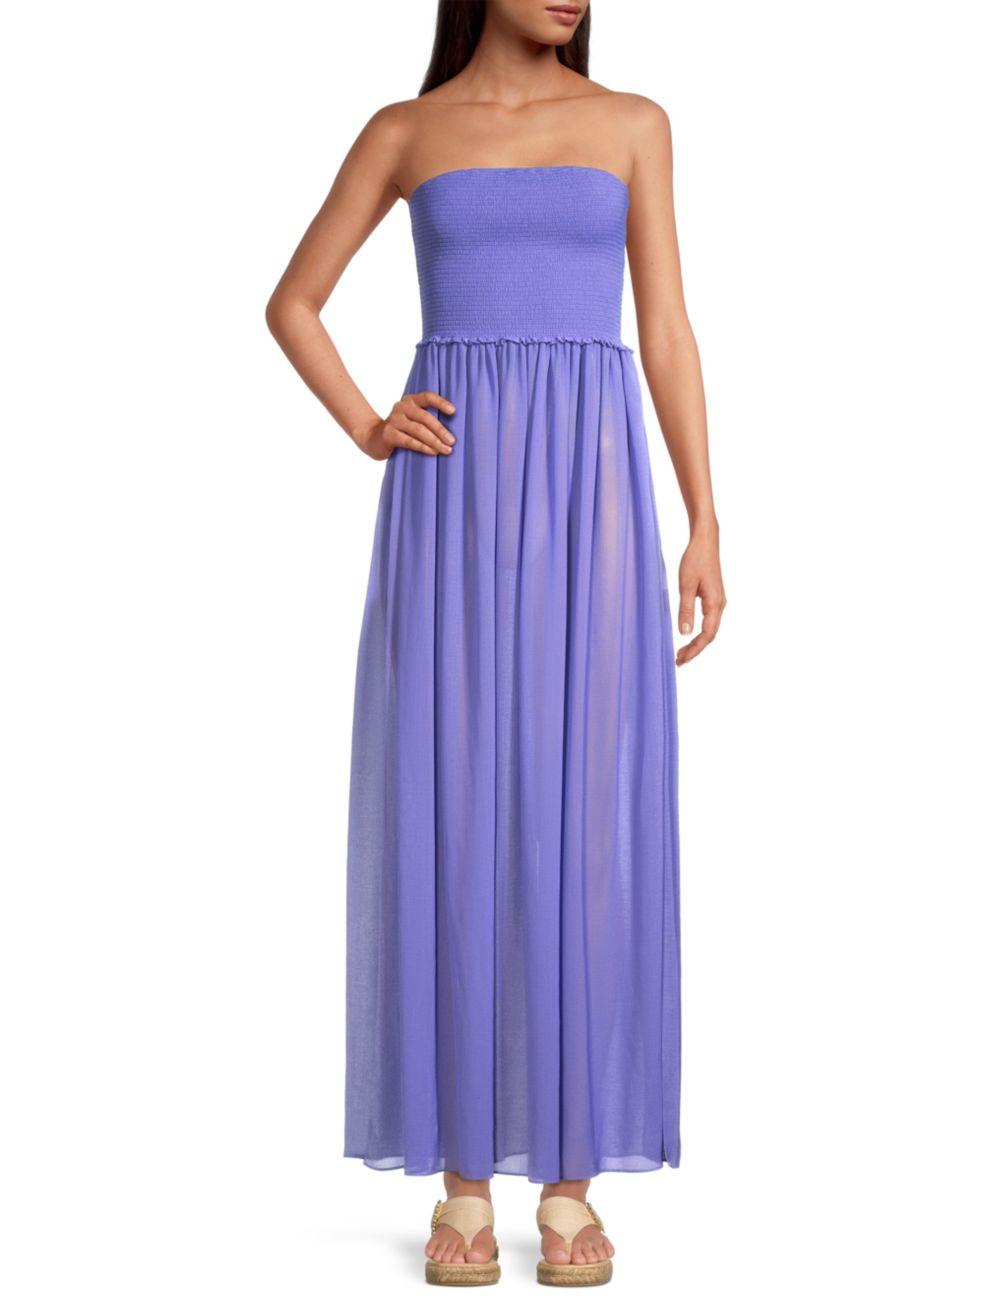 Ramy Brook Calista Smocked Strapless Flare Dress   SaksFifthAvenue